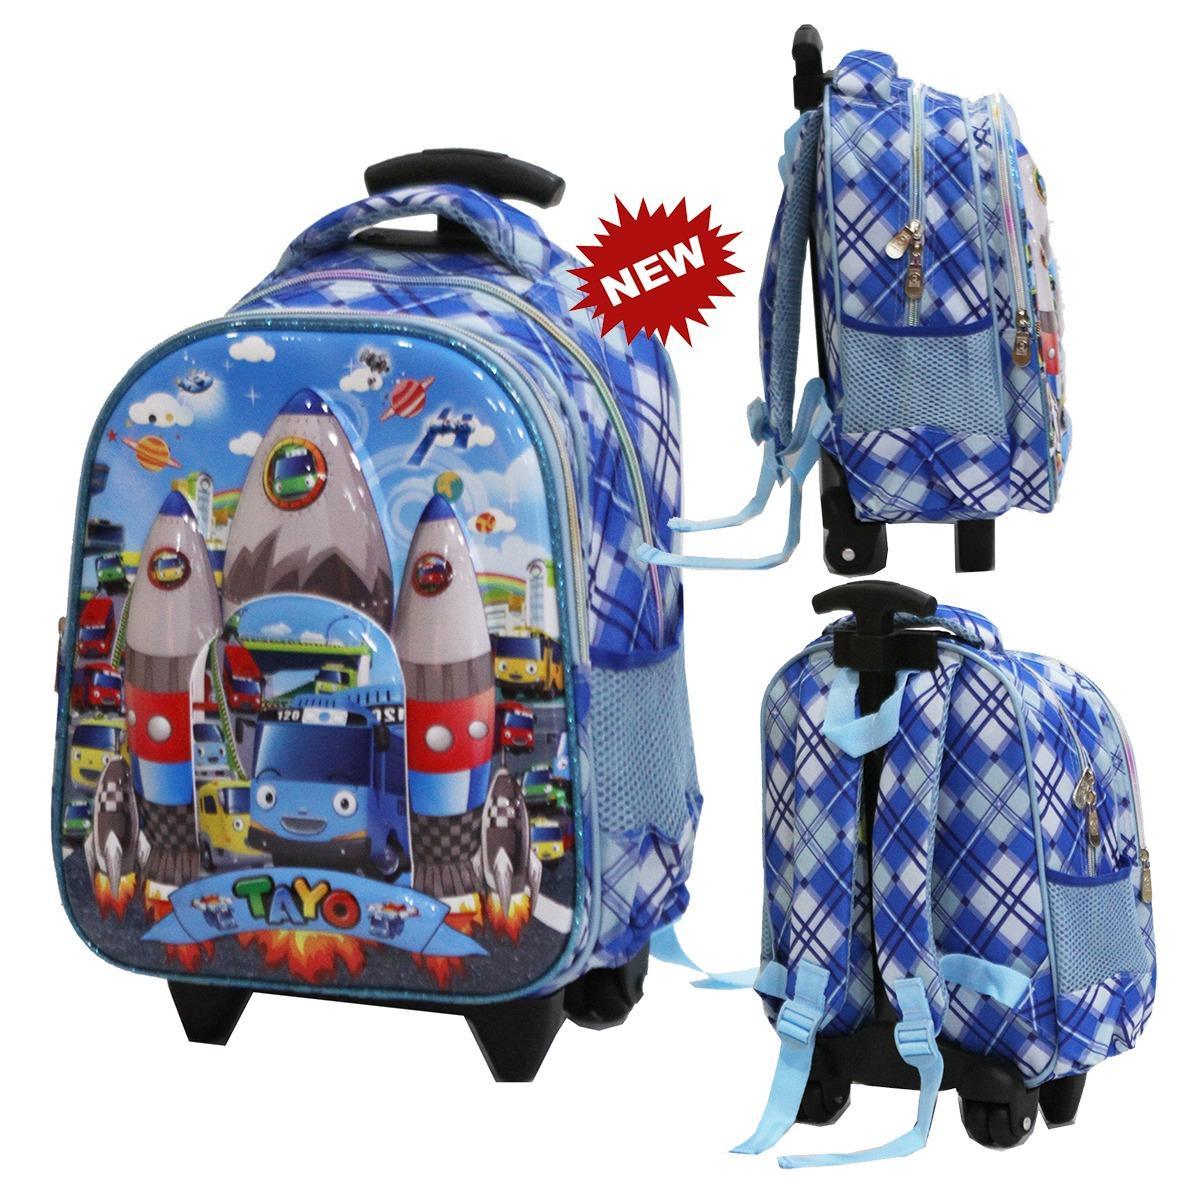 Onlan Tas Trolley Anak Sekolah TK Karakter Anak Laki Laki TAYO 6D Timbul Import - Biru